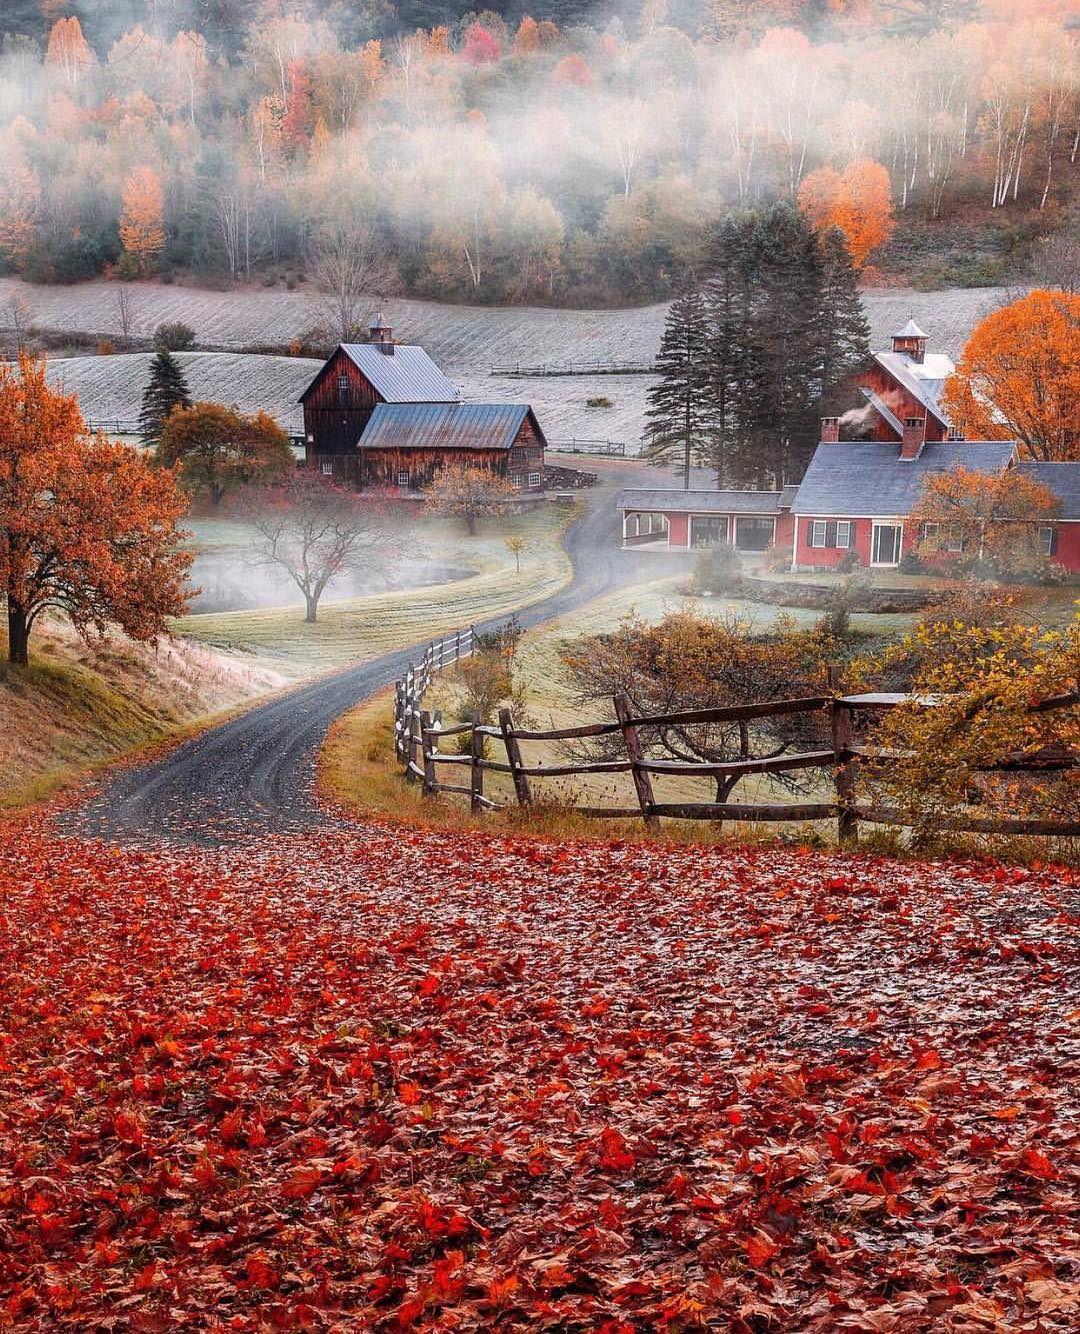 Vermont Scenery Autumn Scenes Best Travel Insurance